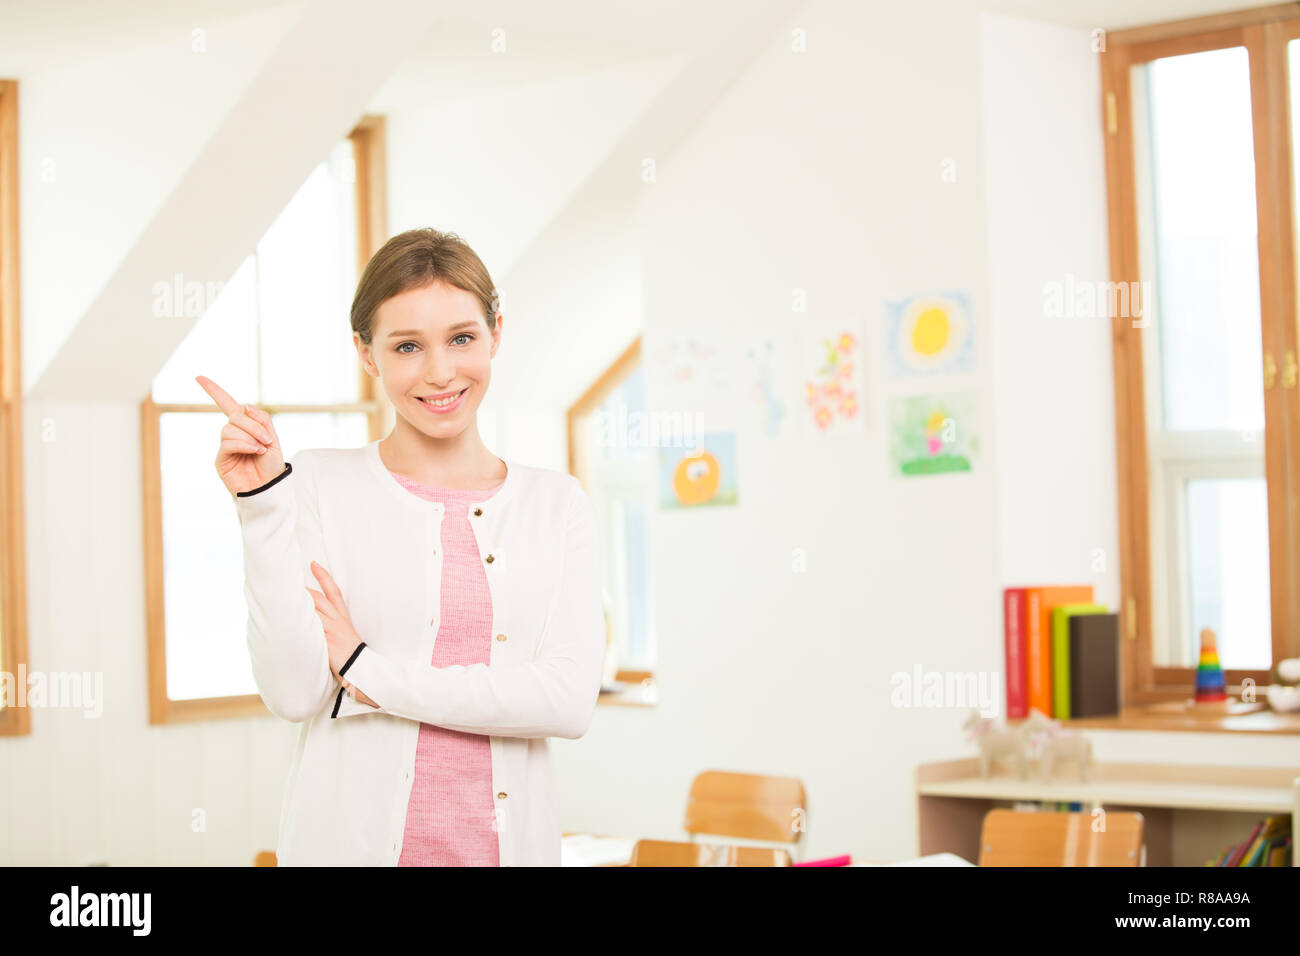 Female Teacher In A Classroom - Stock Image